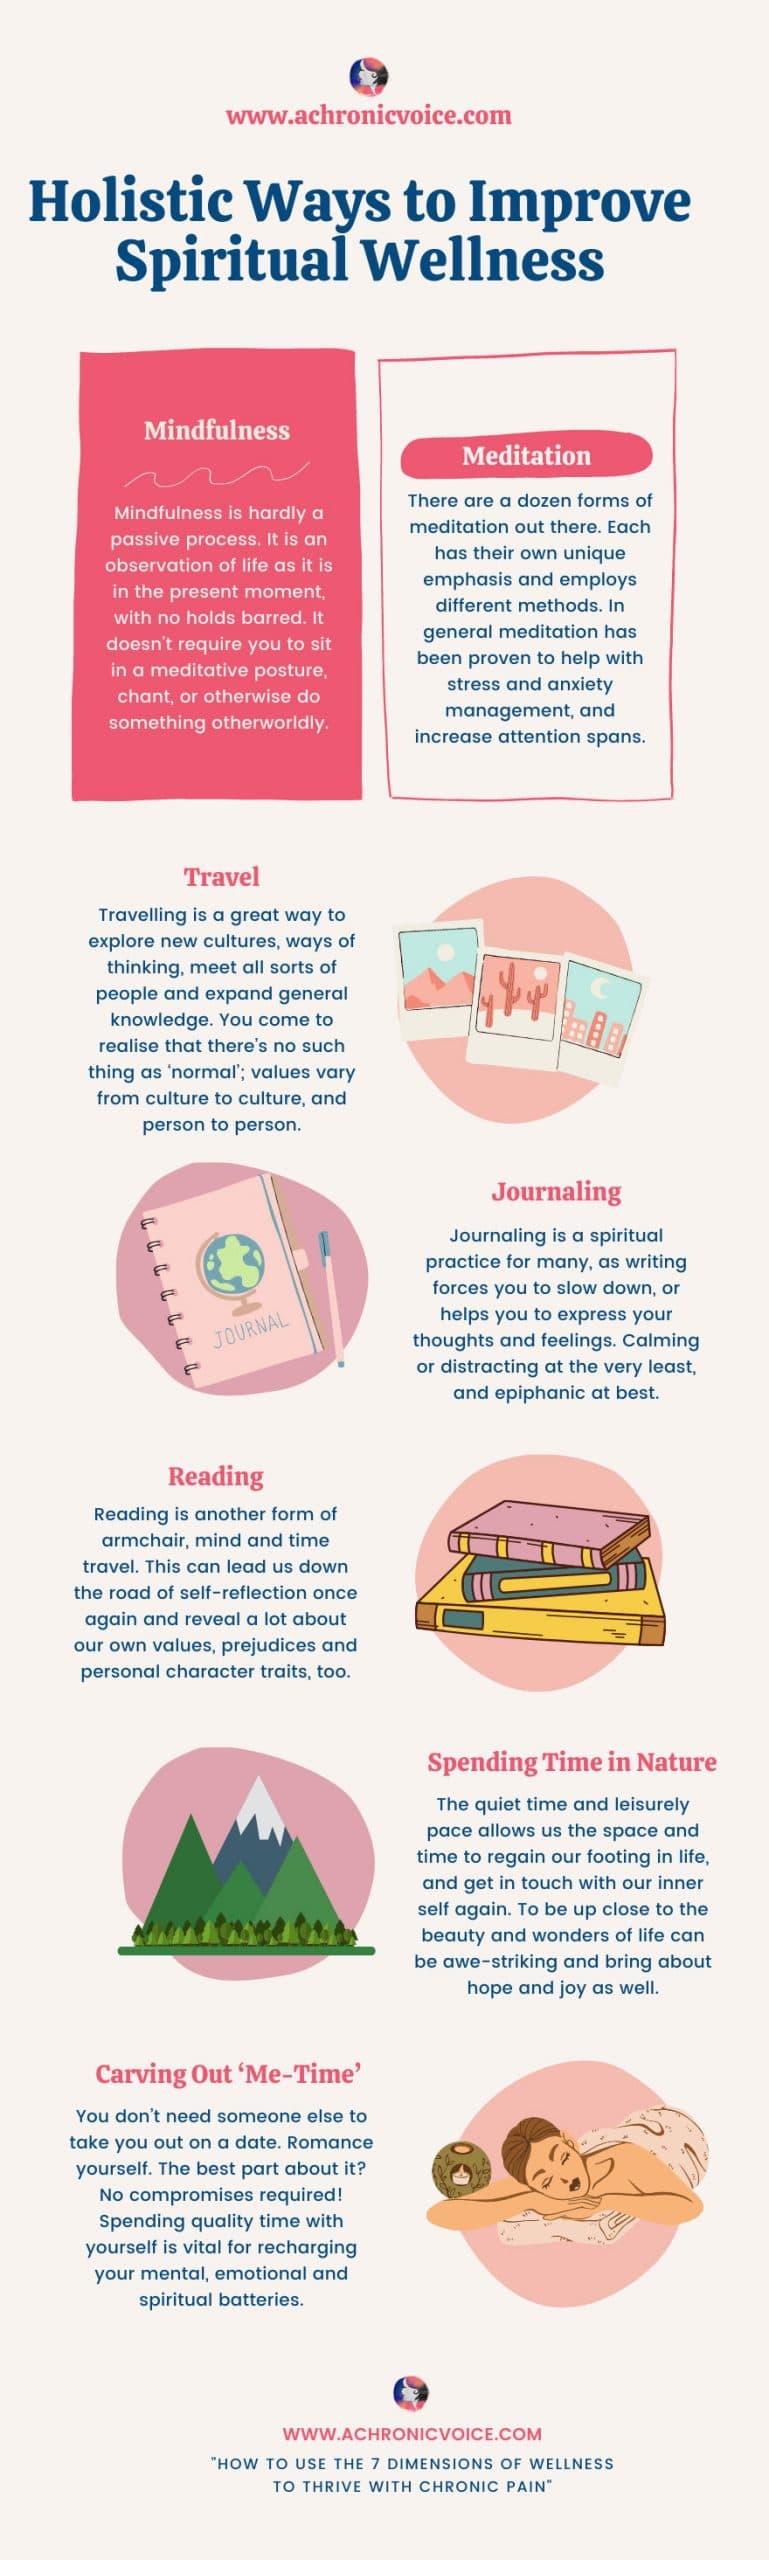 Holistic Ways to Improve Spiritual Wellness Infographic